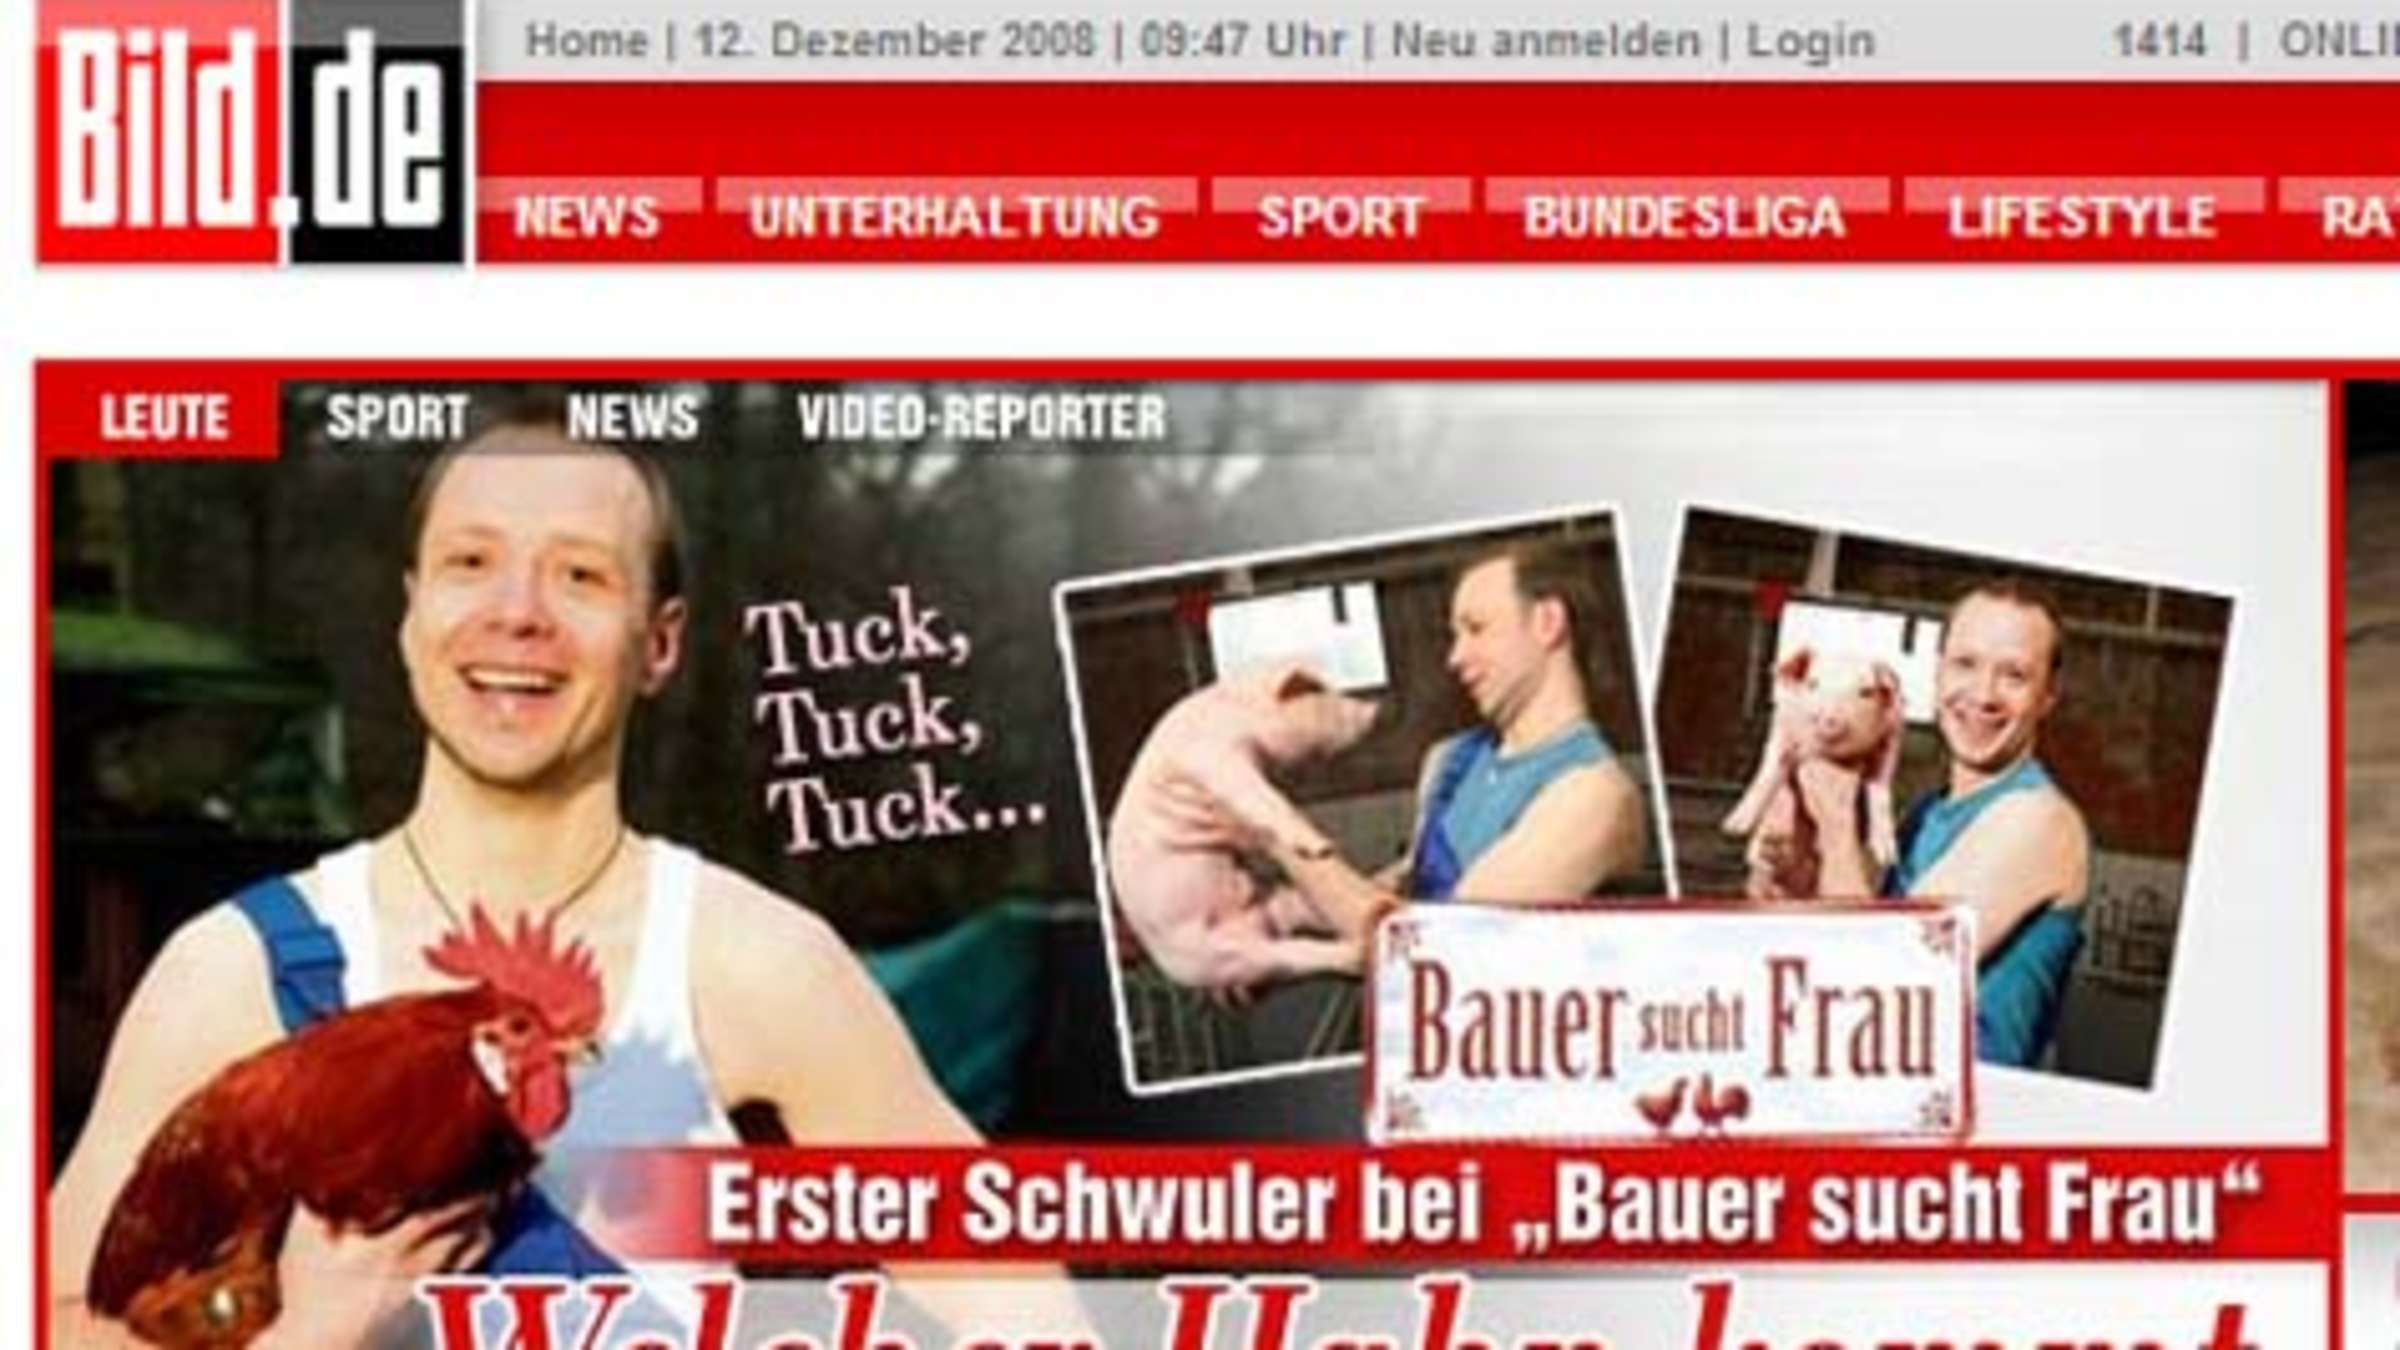 Bauer sucht frau casting